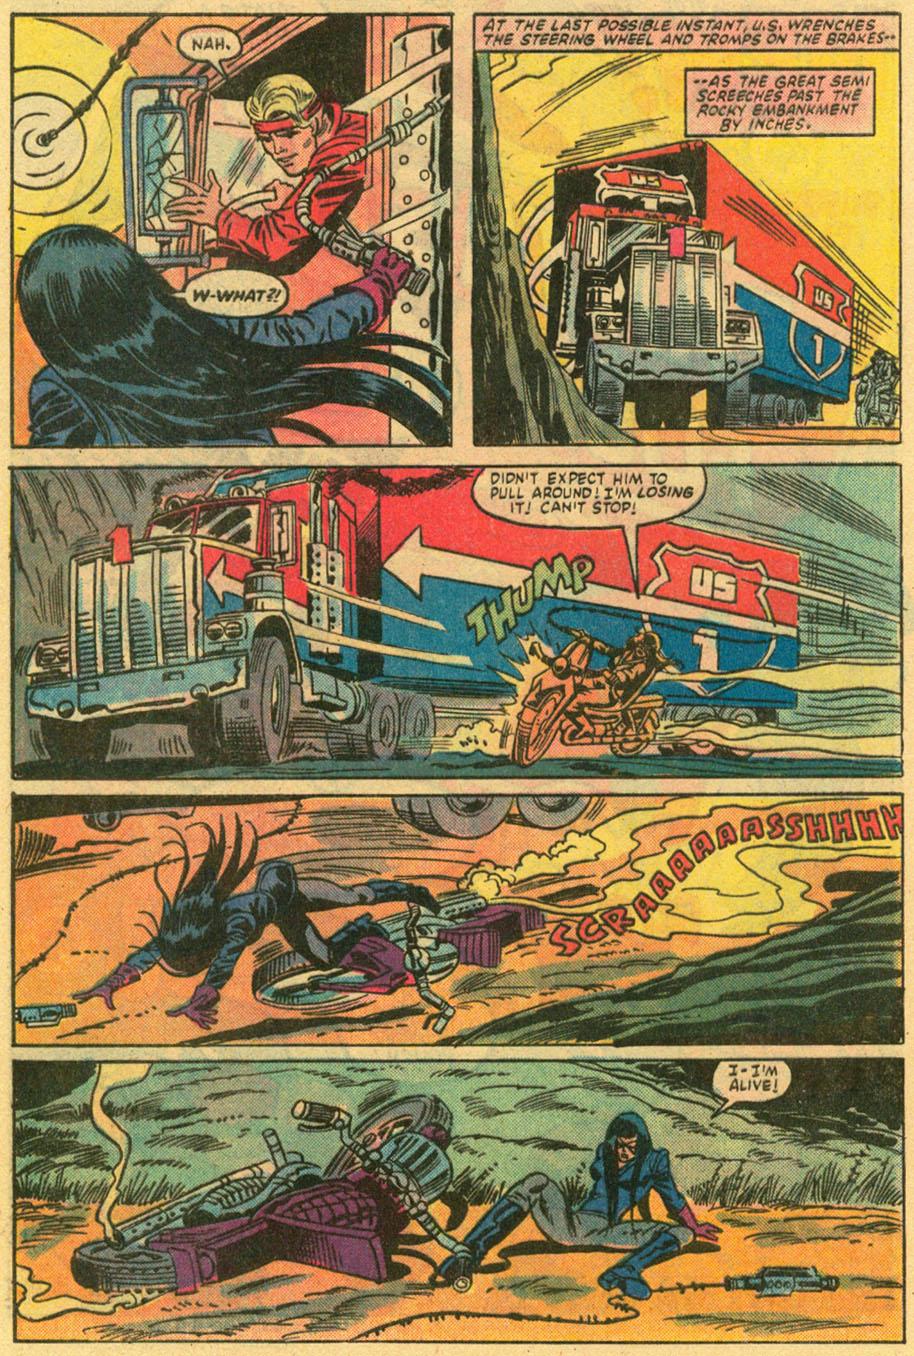 Read online U.S. 1 comic -  Issue #2 - 23